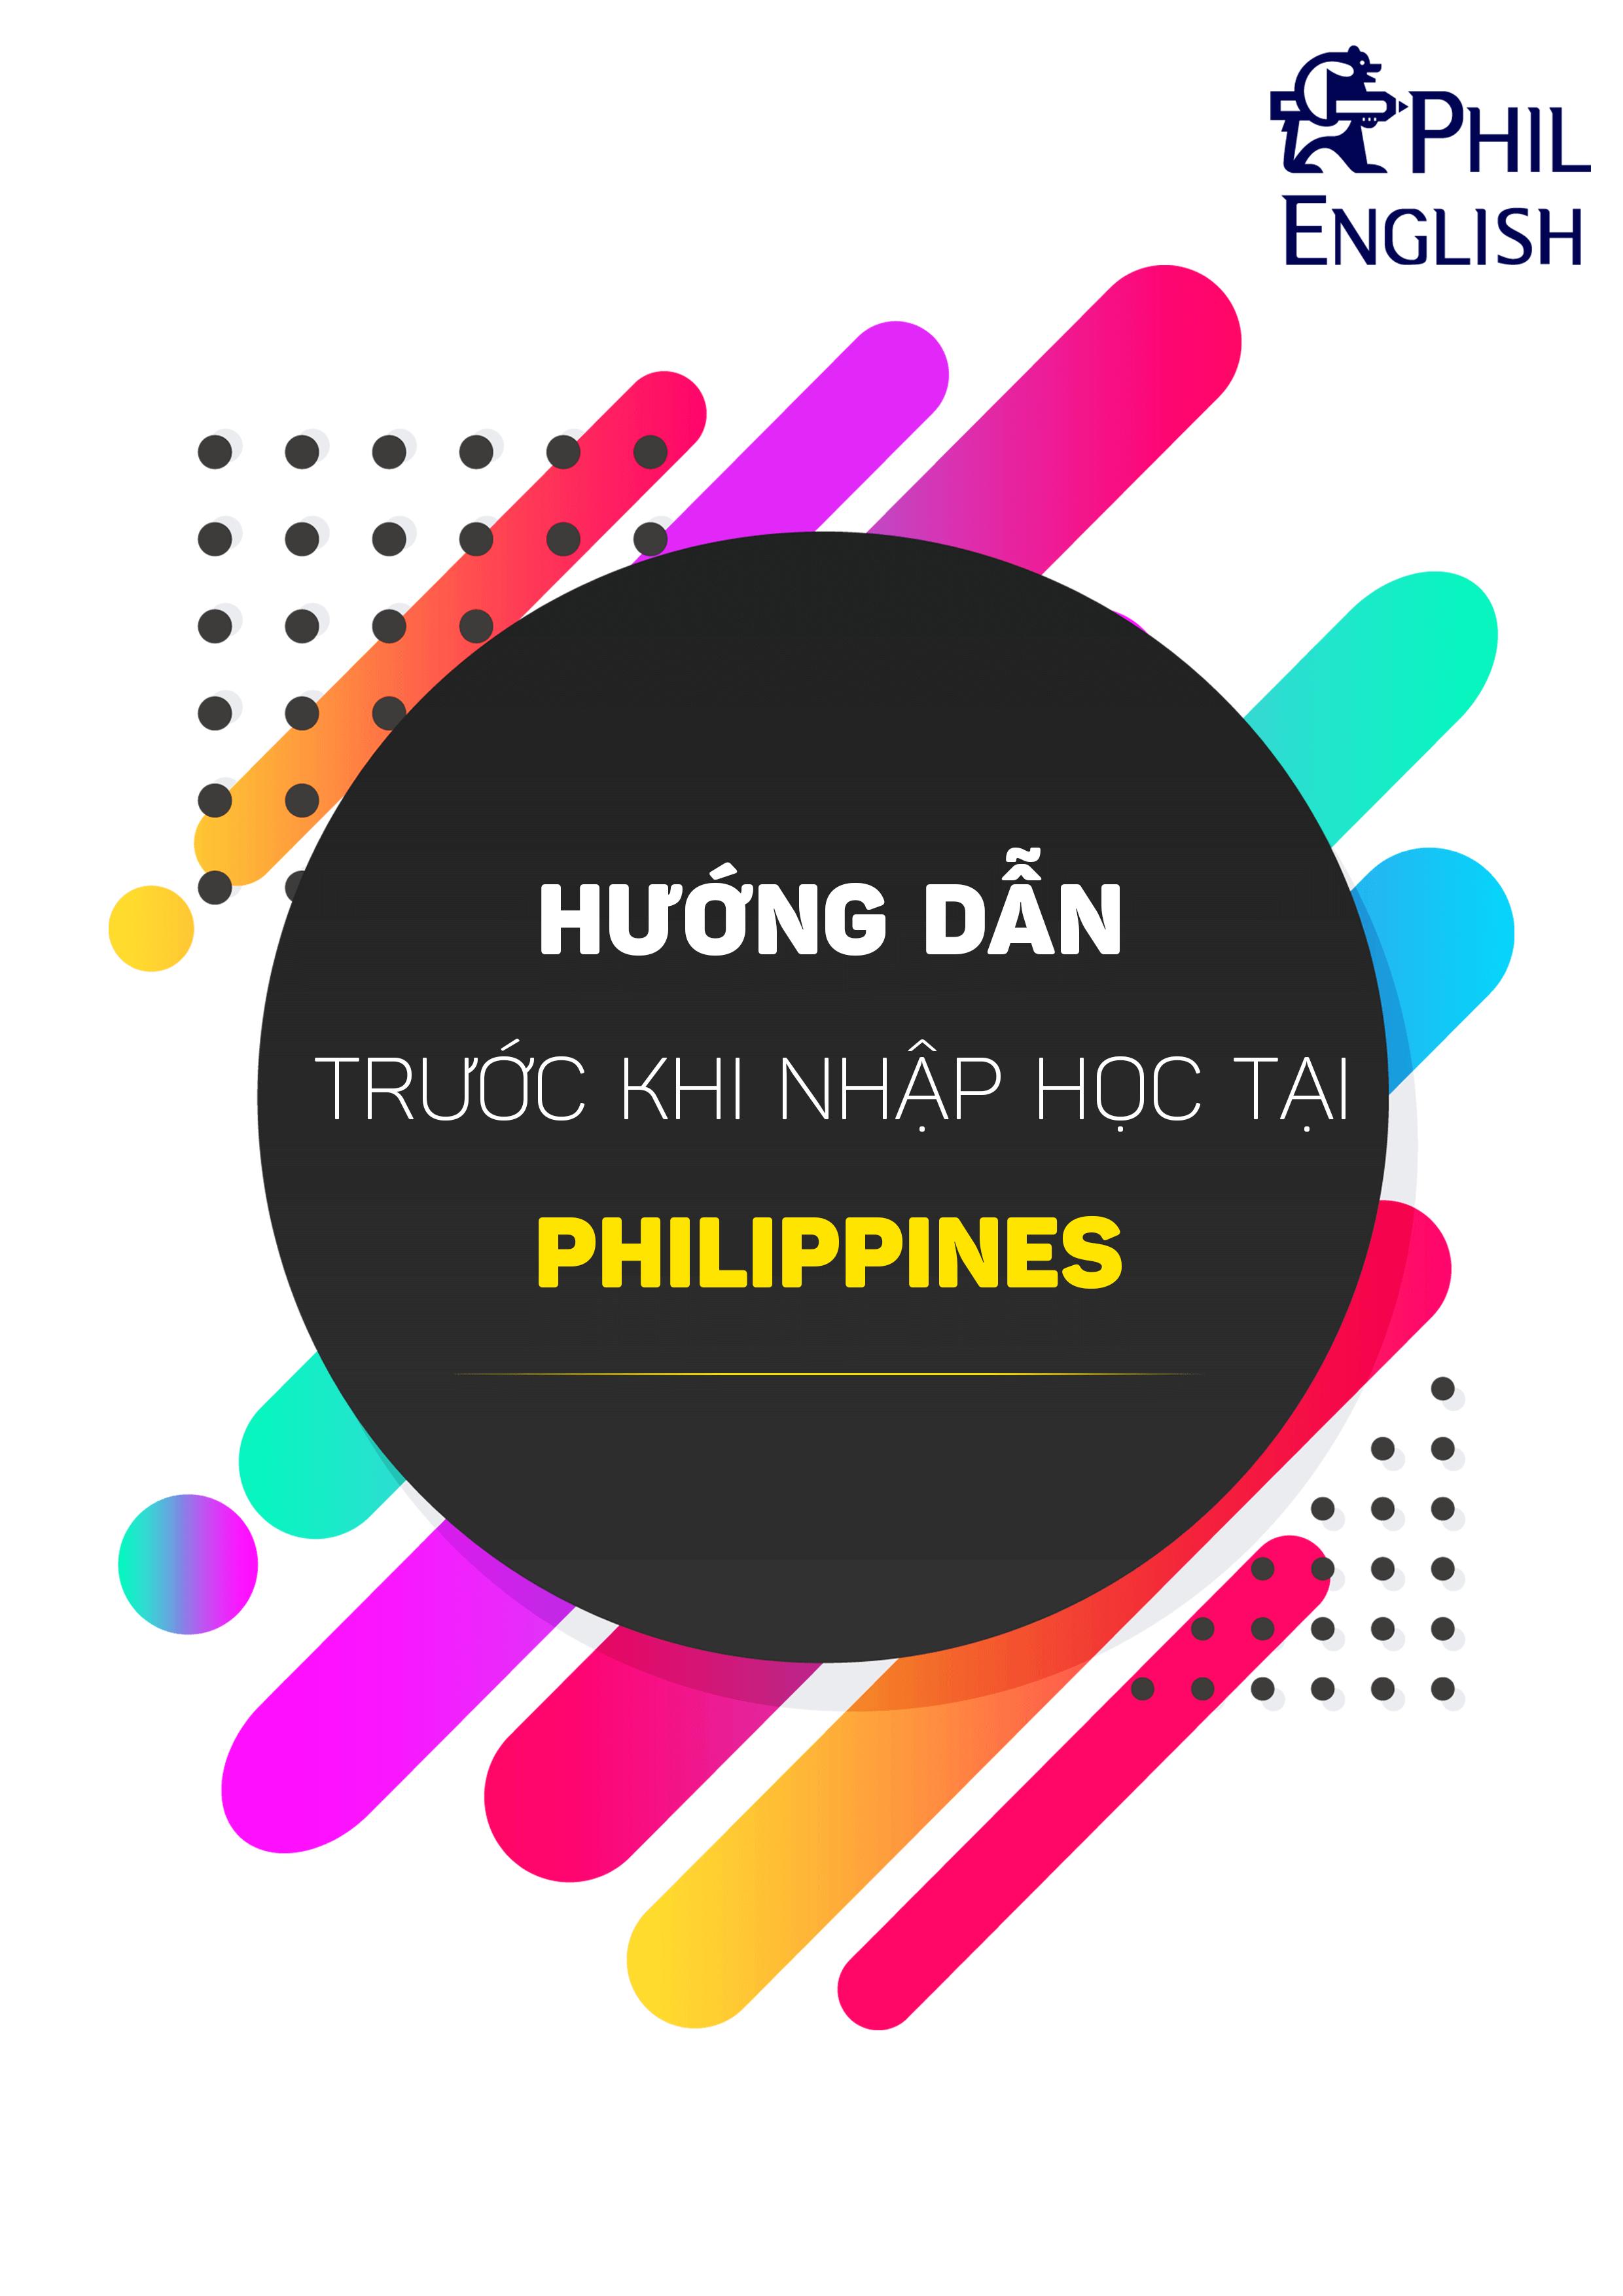 huong-dan-truoc-khi-nhap-hoc-tai-philippines-1